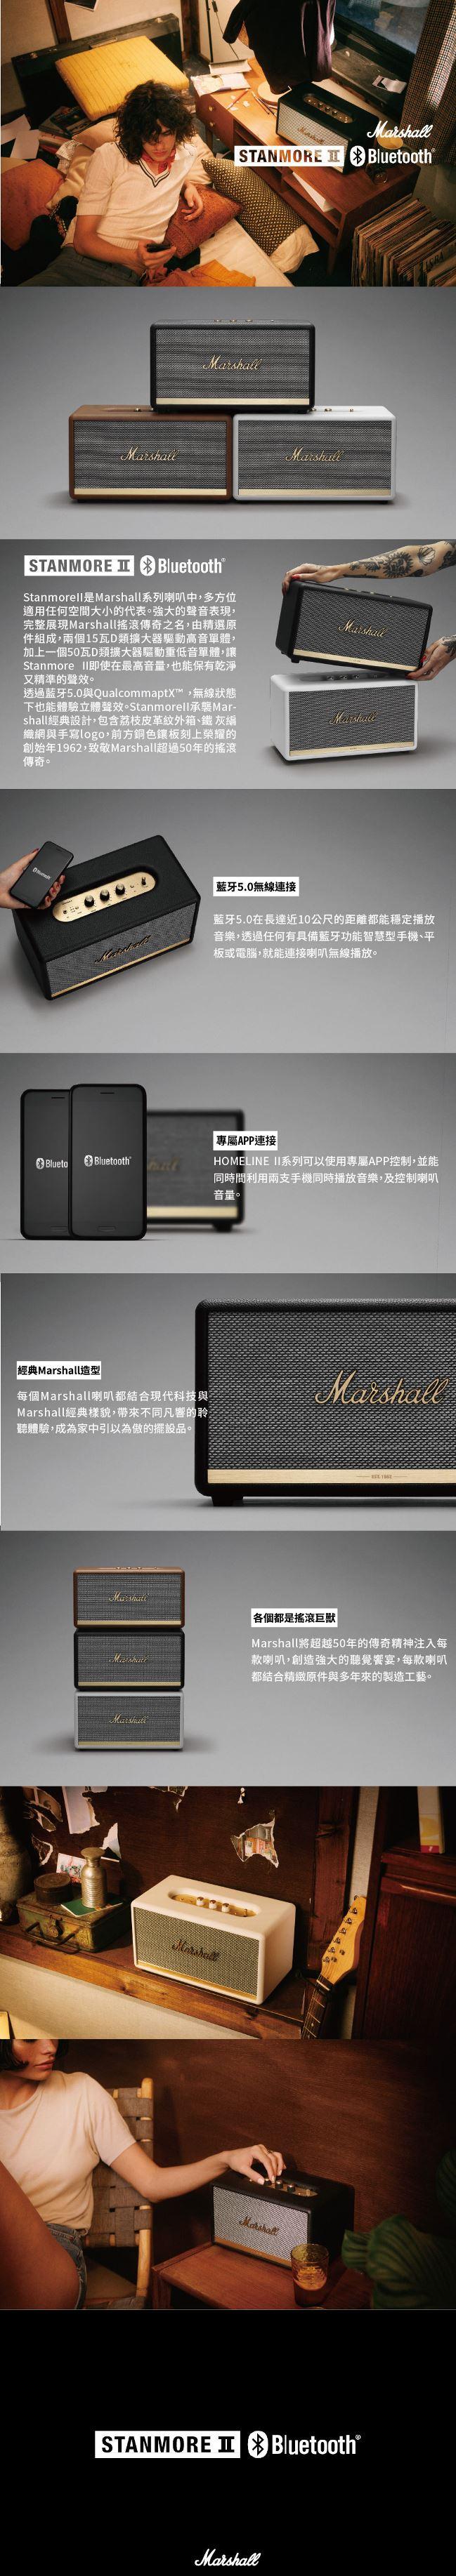 (複製)Marshall|Stanmore II 藍牙喇叭 - 奶油白